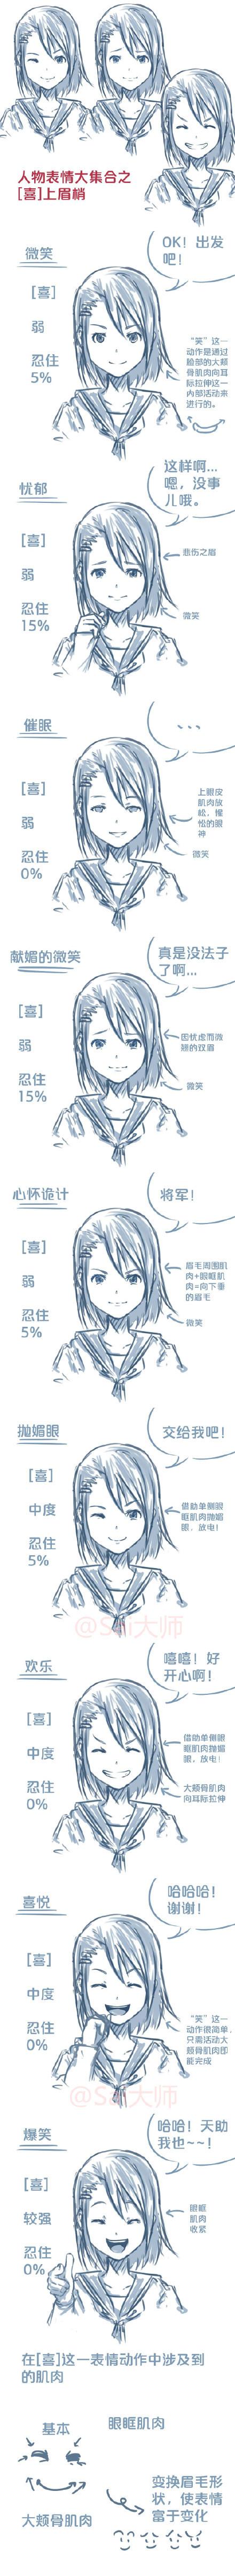 Pin By Tzs Shan Tsang On Heads Drawing Expressions Anime Tutorial Drawing Skills